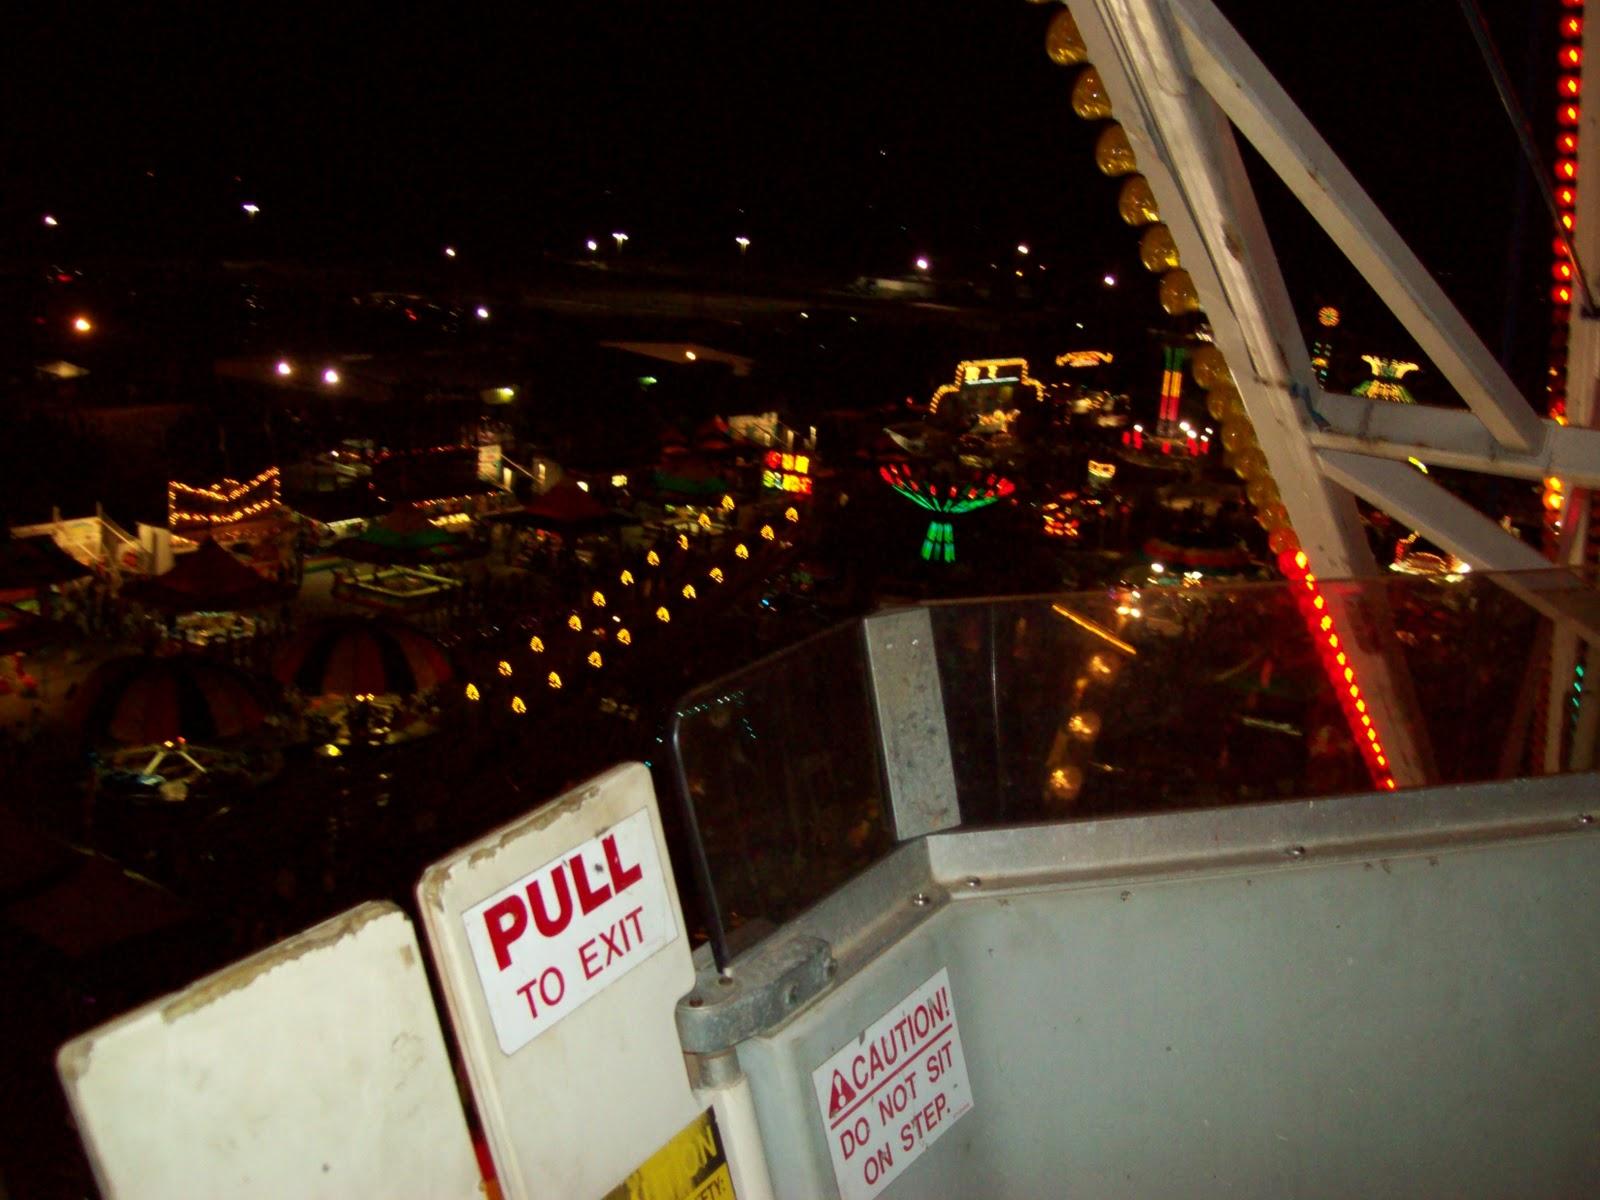 Fort Bend County Fair - 101_5455.JPG